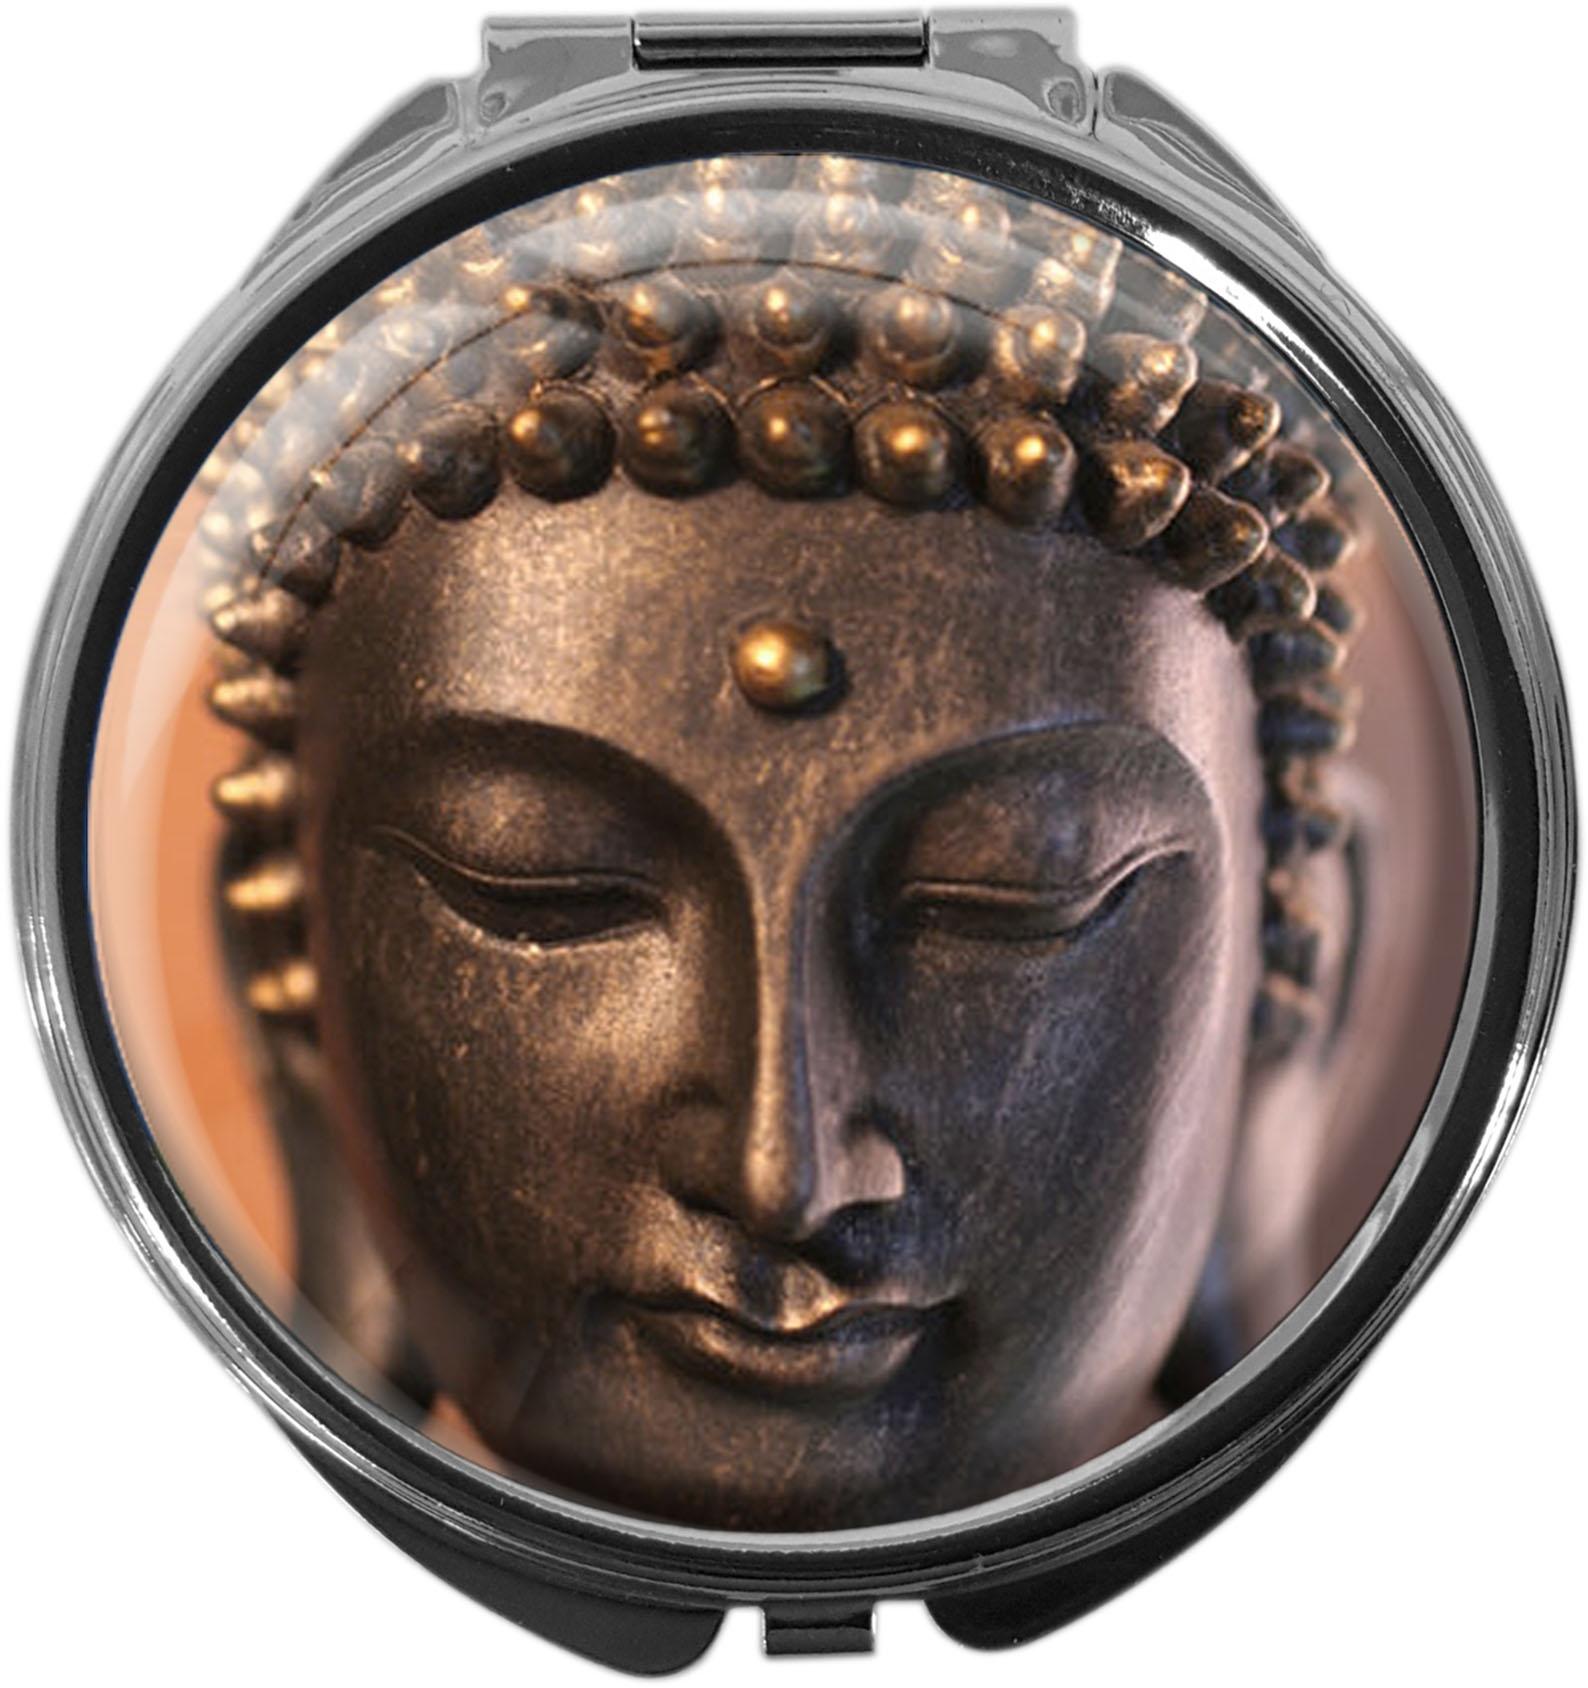 Pillendose aus Metall | BUDDAH | metALUm #00010